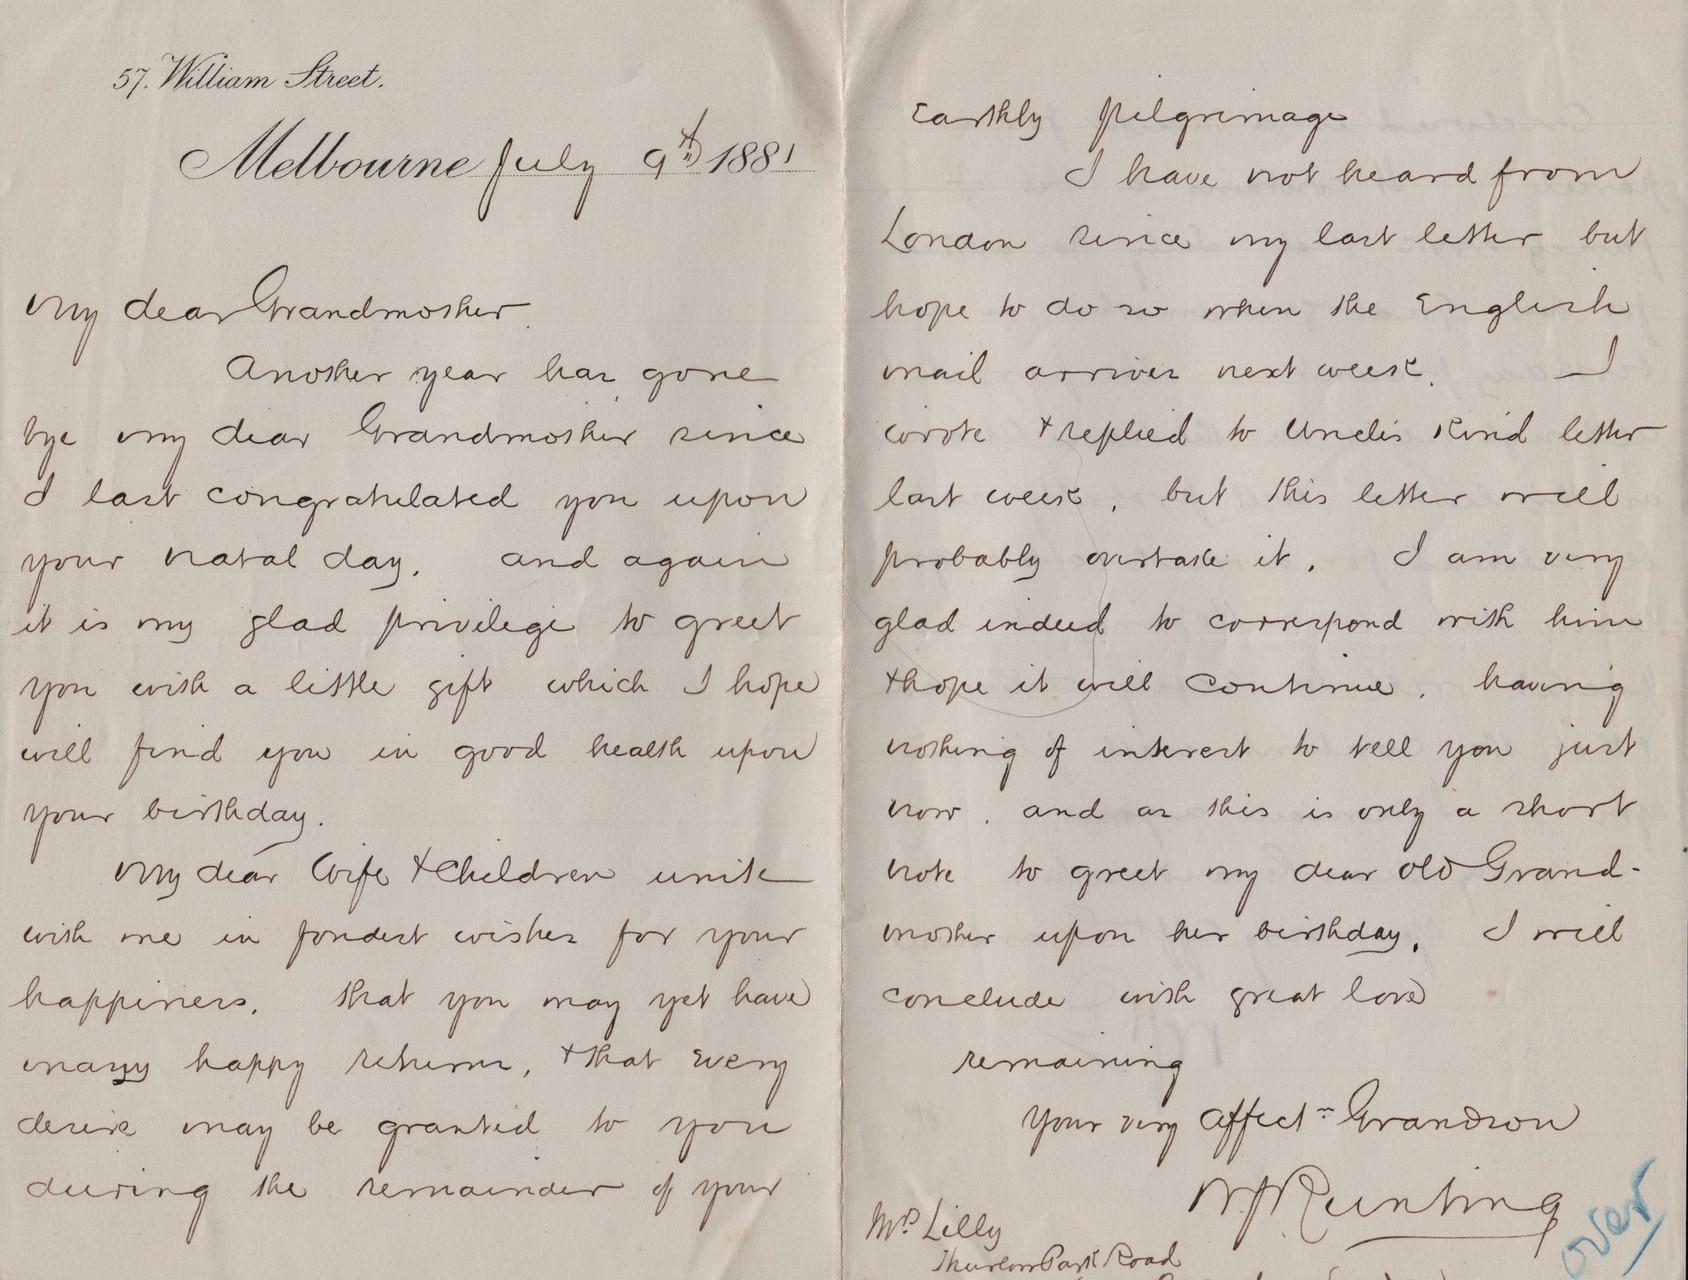 1881 July 9th